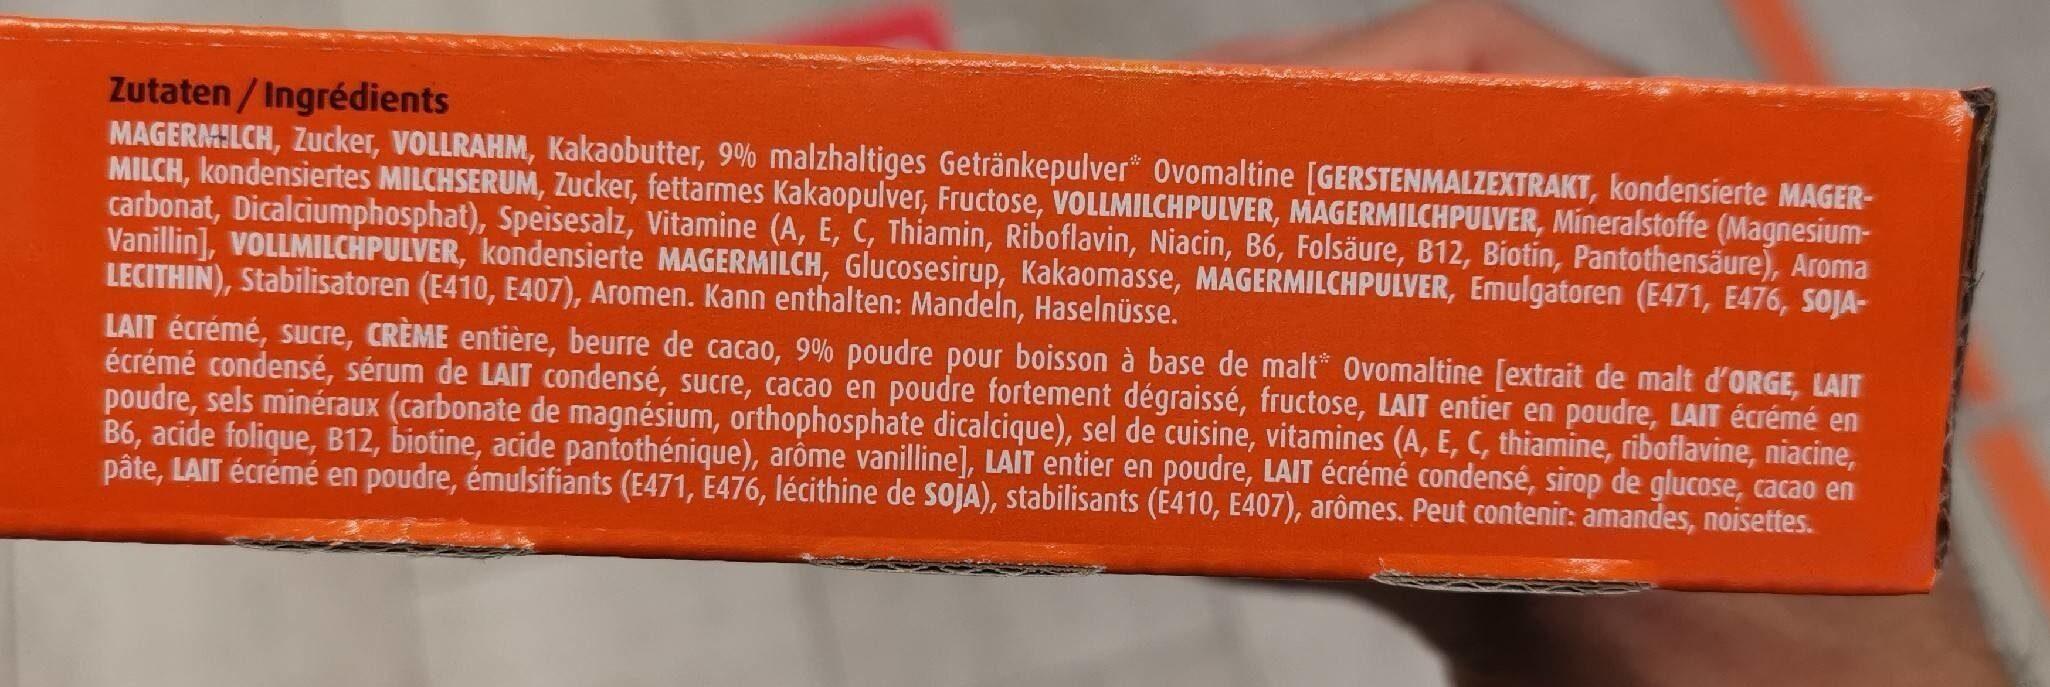 Glace batonnet - Valori nutrizionali - fr